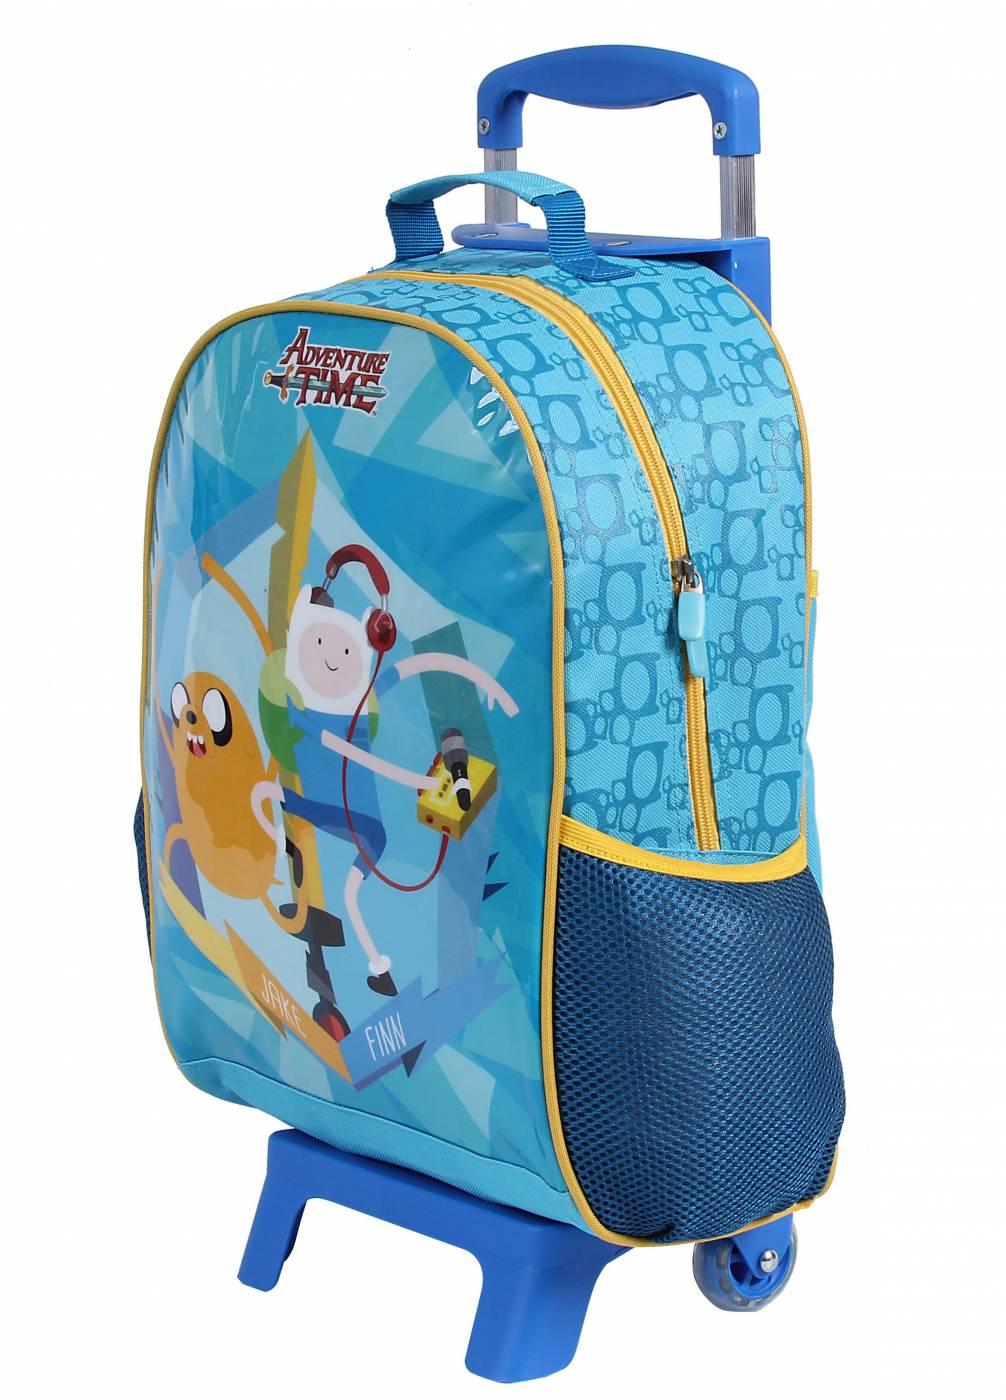 Mochilete Grande DMW Adventure Time 49028